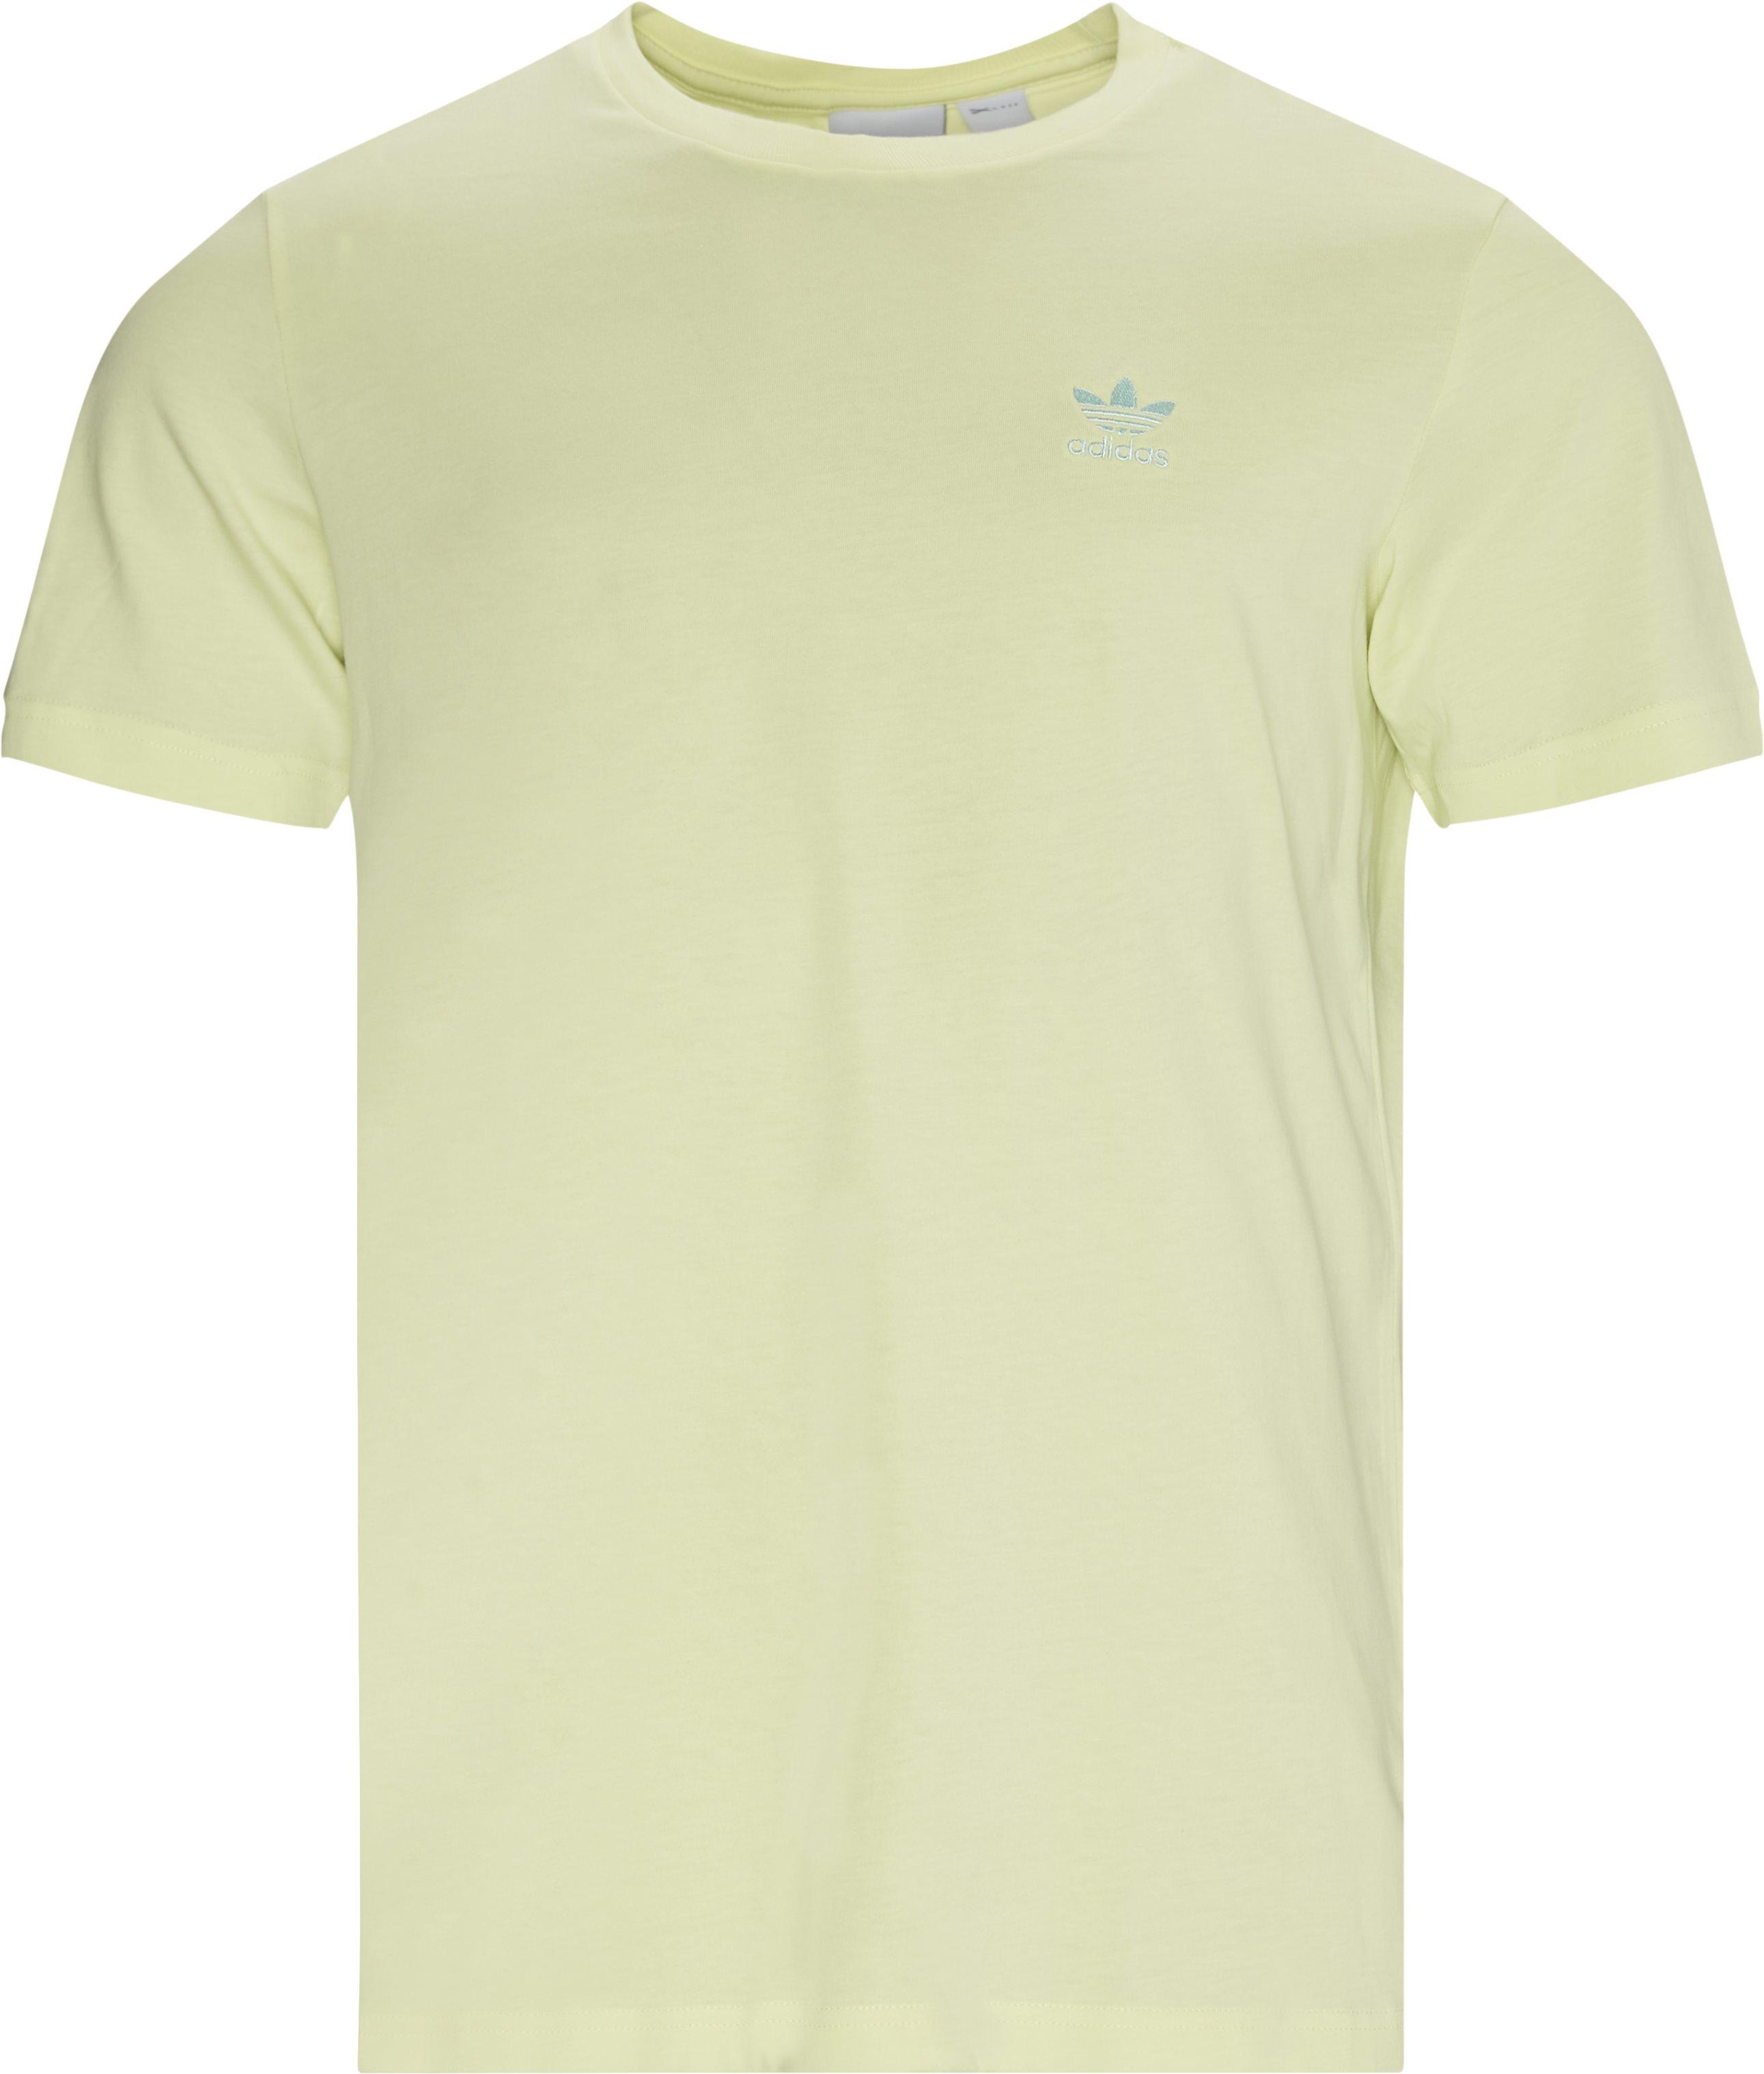 Essential Tee - T-shirts - Regular - Yellow